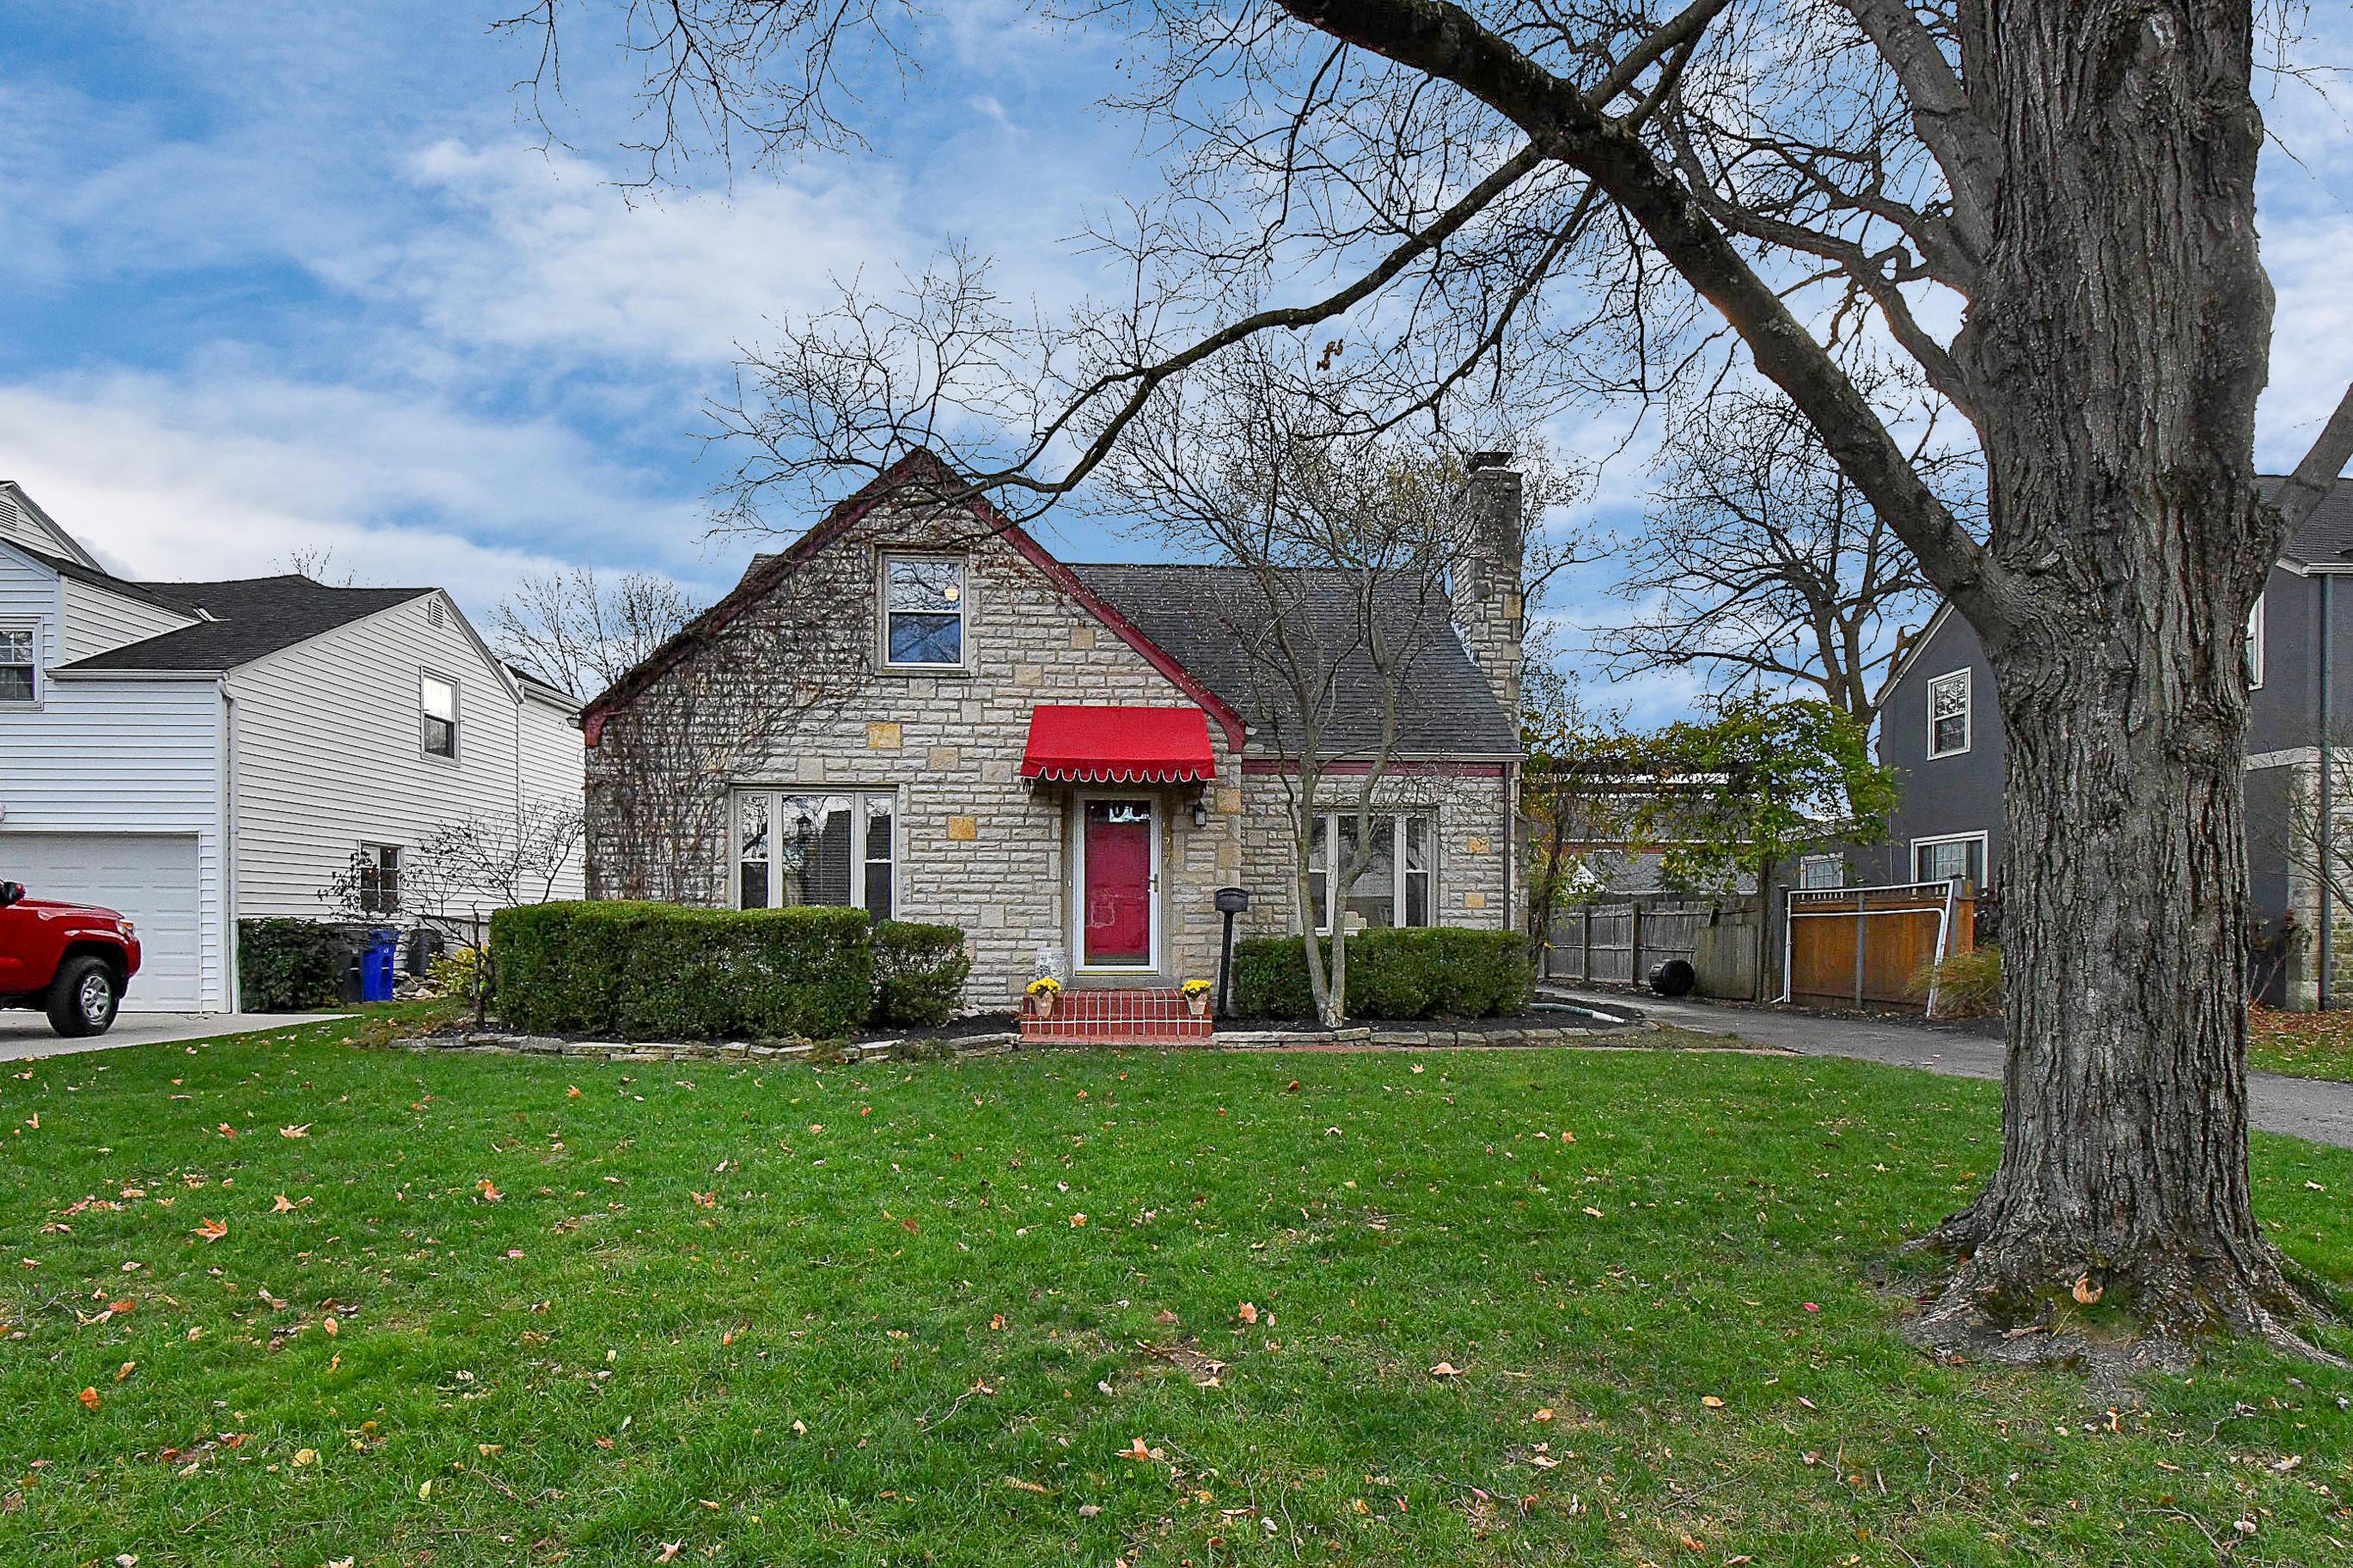 1537 Barrington Road, Columbus, Ohio 43221, 3 Bedrooms Bedrooms, ,3 BathroomsBathrooms,Residential,For Sale,Barrington,220040857